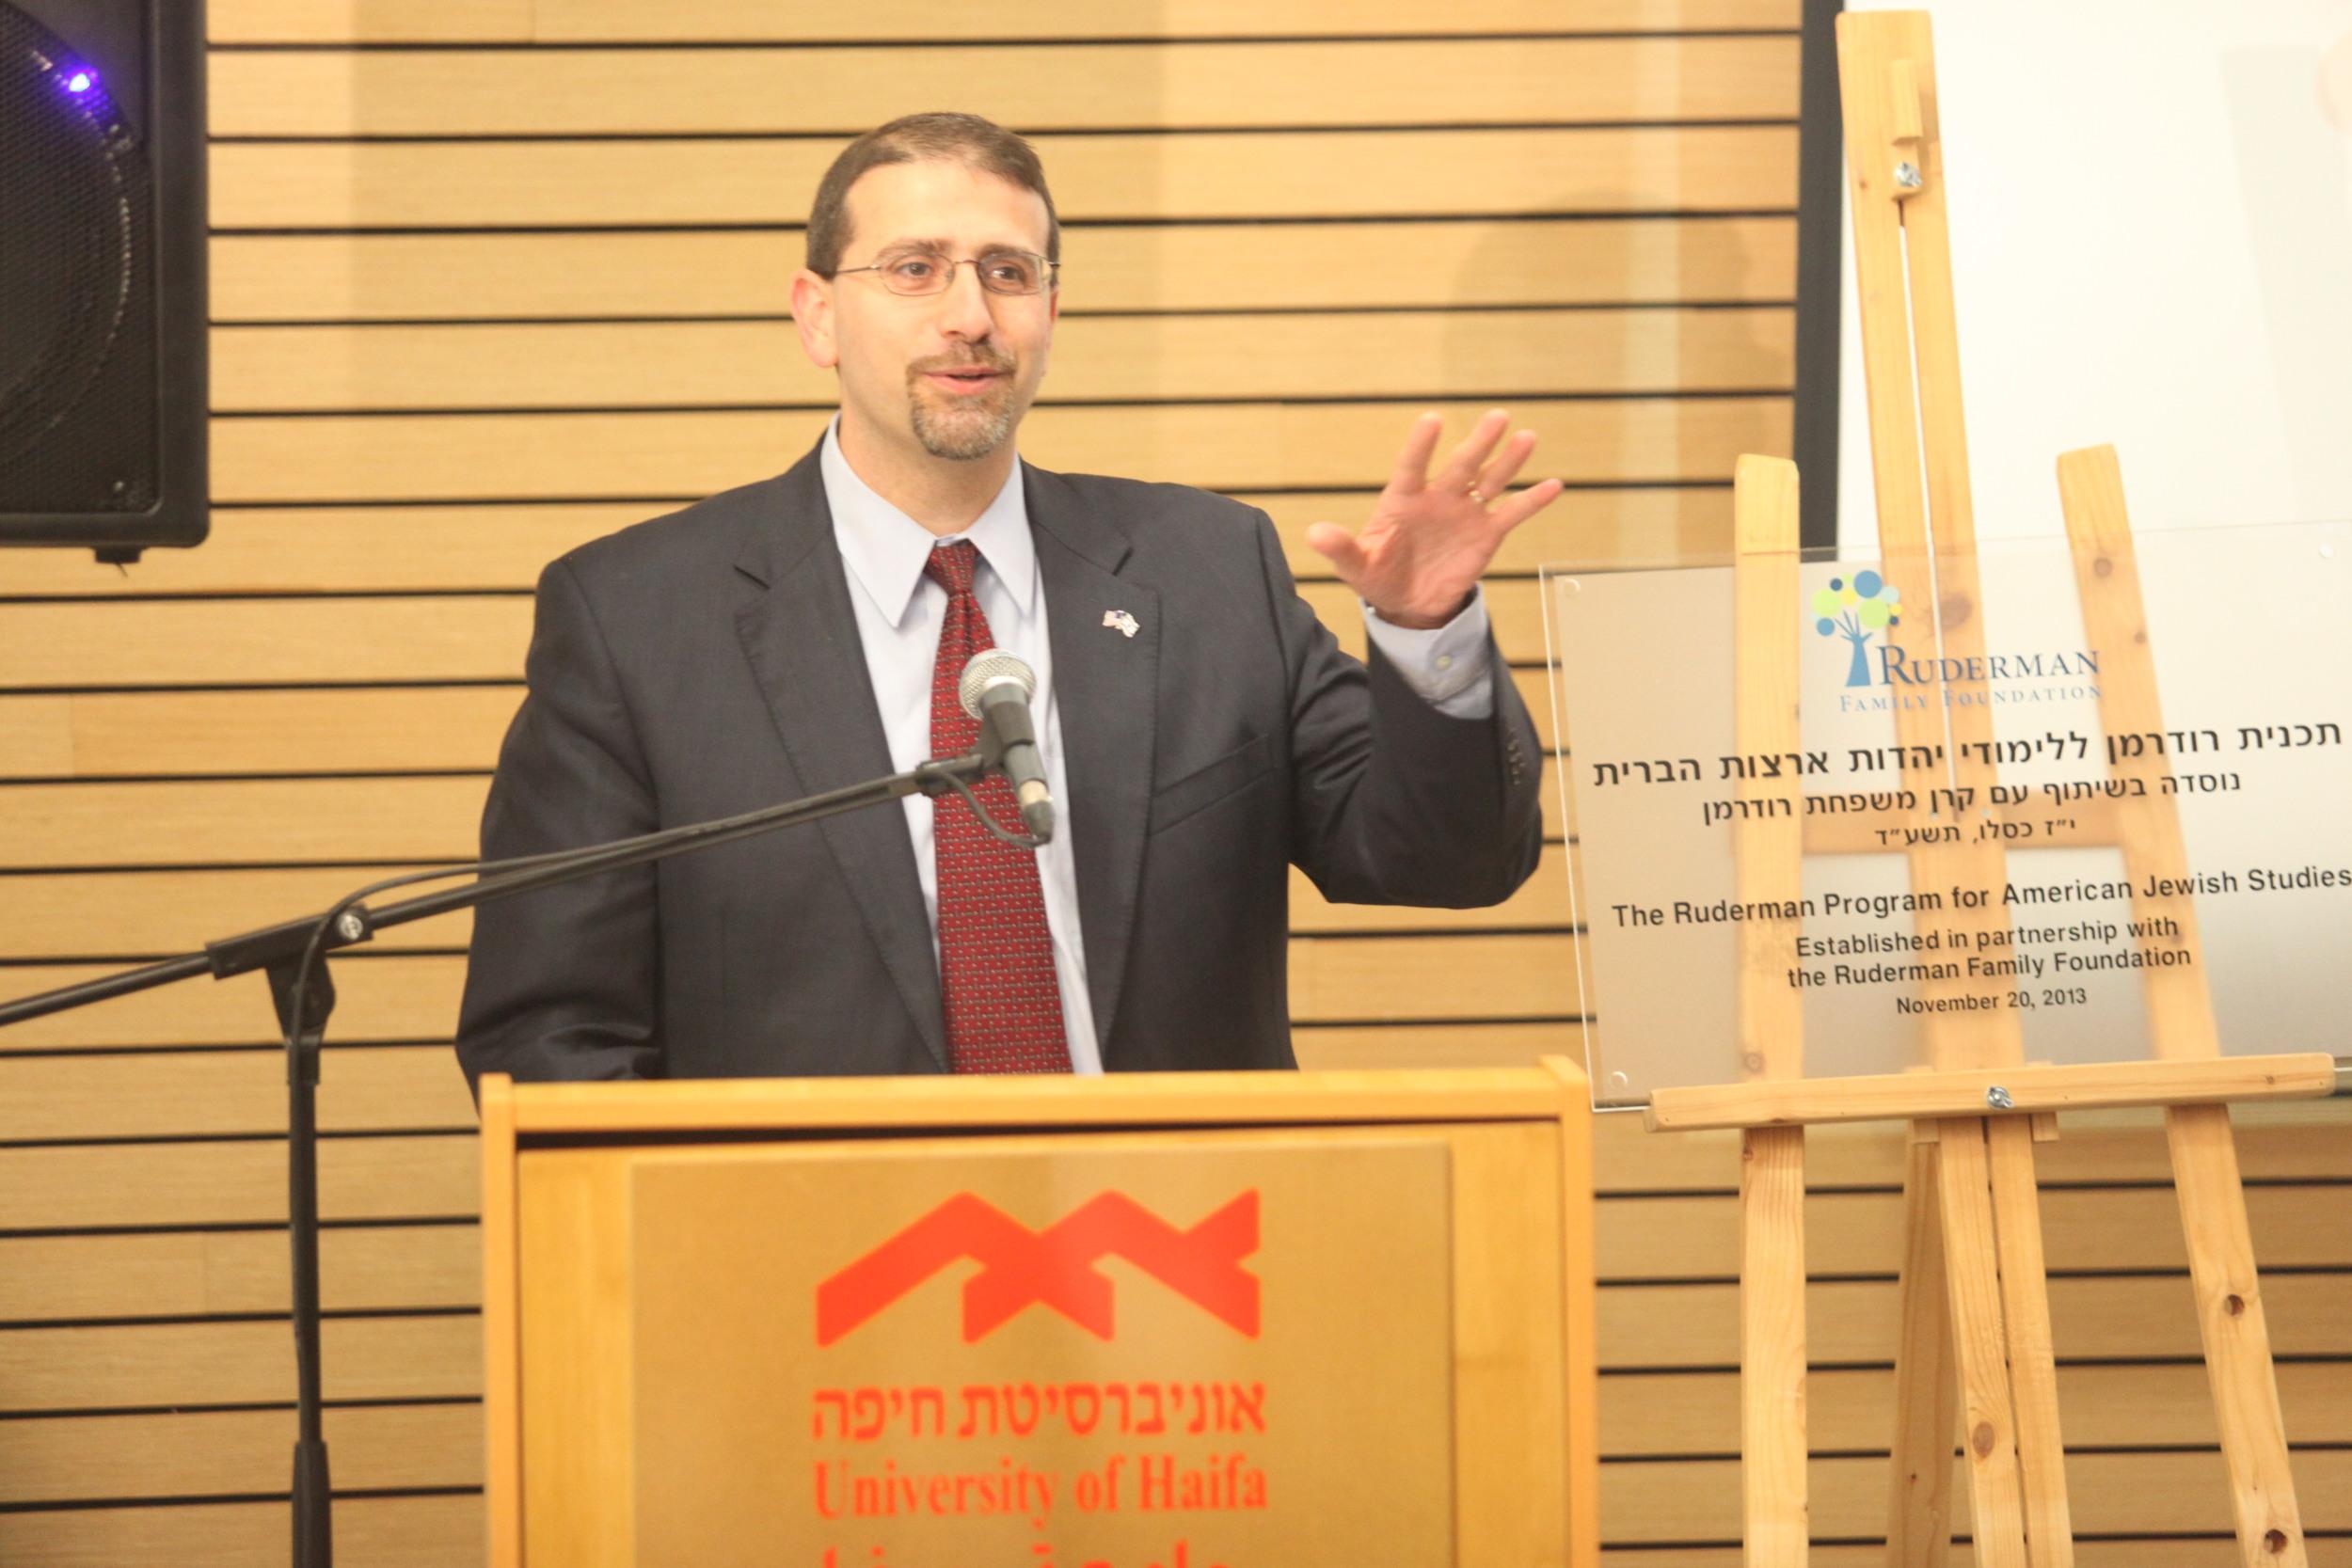 Click photo to download.U.S. Ambassador to Israel Daniel B. Shapirospeaks Nov. 20 at the inaugural event of the Ruderman Program for American Jewish Studies at the University of Haifa  .Credit: Gil Hadani/Allpix.